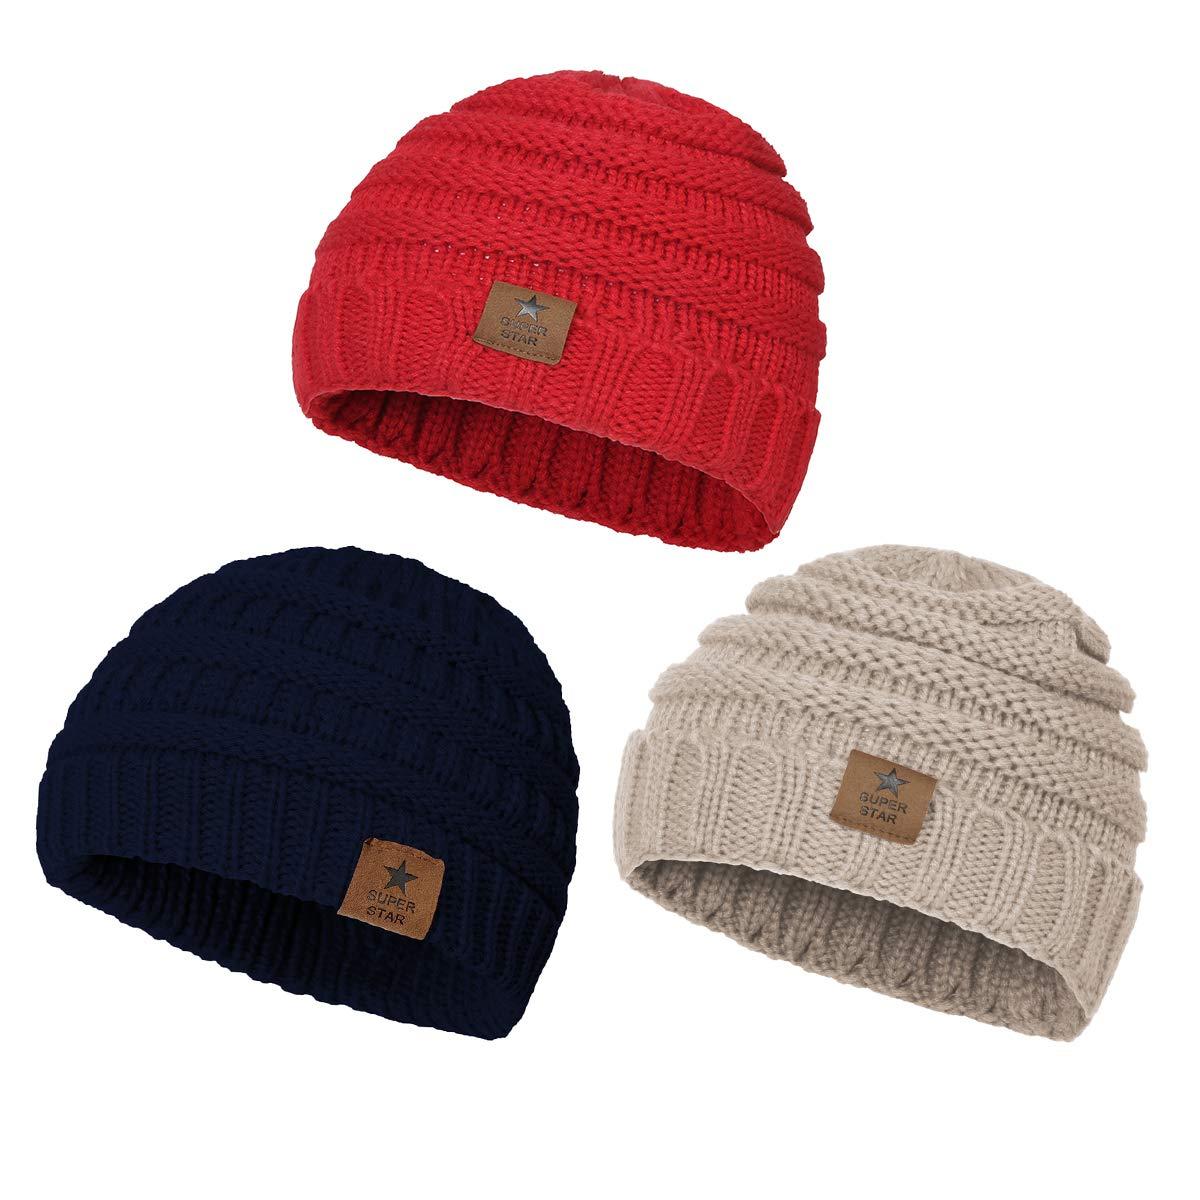 Amazon.com  Zando Baby Winter Hats Caps Warm Infant Toddler Children s Beanie  Knit Hat Girls Boys 0-4 Years Old 3 Pack Red 81476c69474